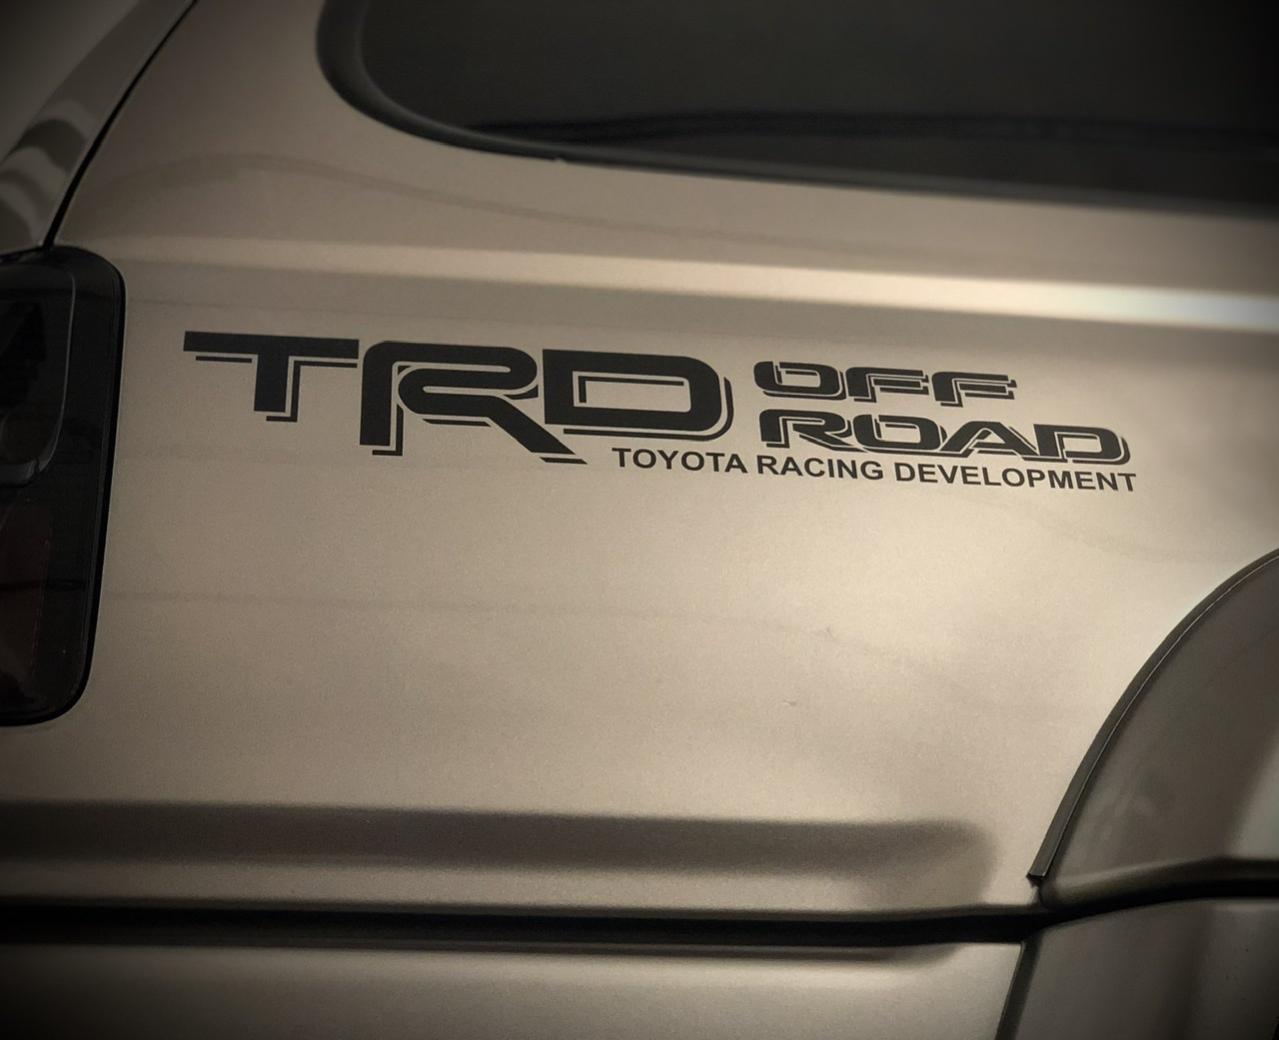 Formidable 2002 Thundercloud Sport TRD Supercharged Version 2.0-e4a4da88-3ac9-4b4a-aff8-f41fba095646-jpg